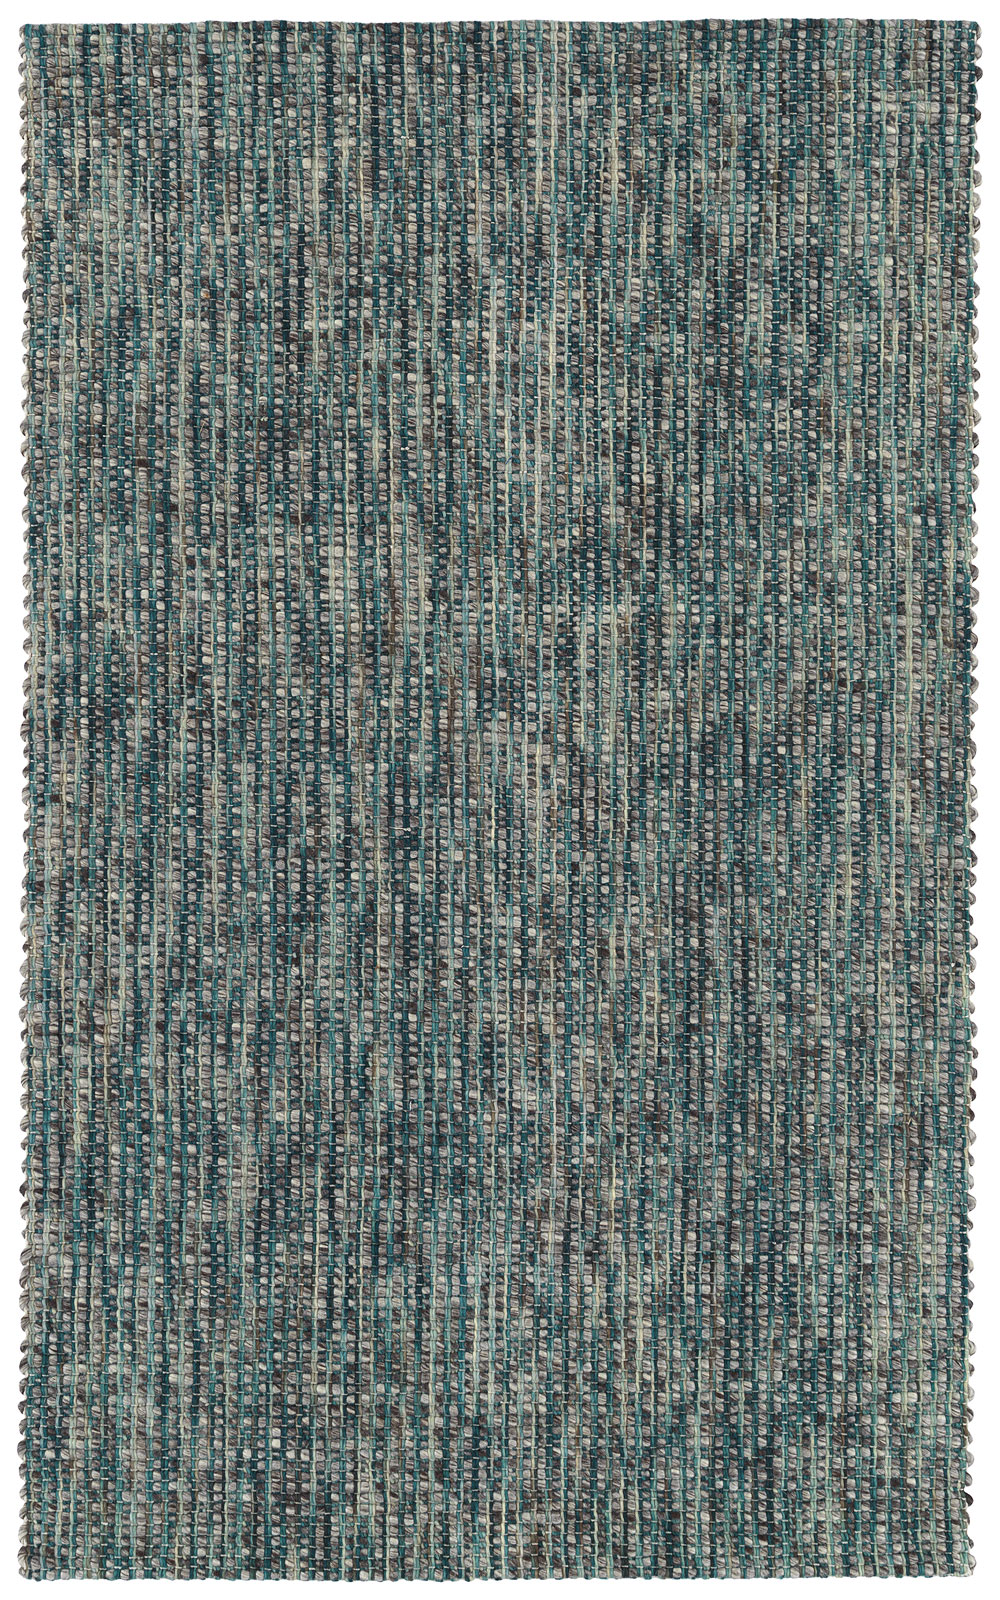 Dalyn Bondi BD1 Turquoise Rug